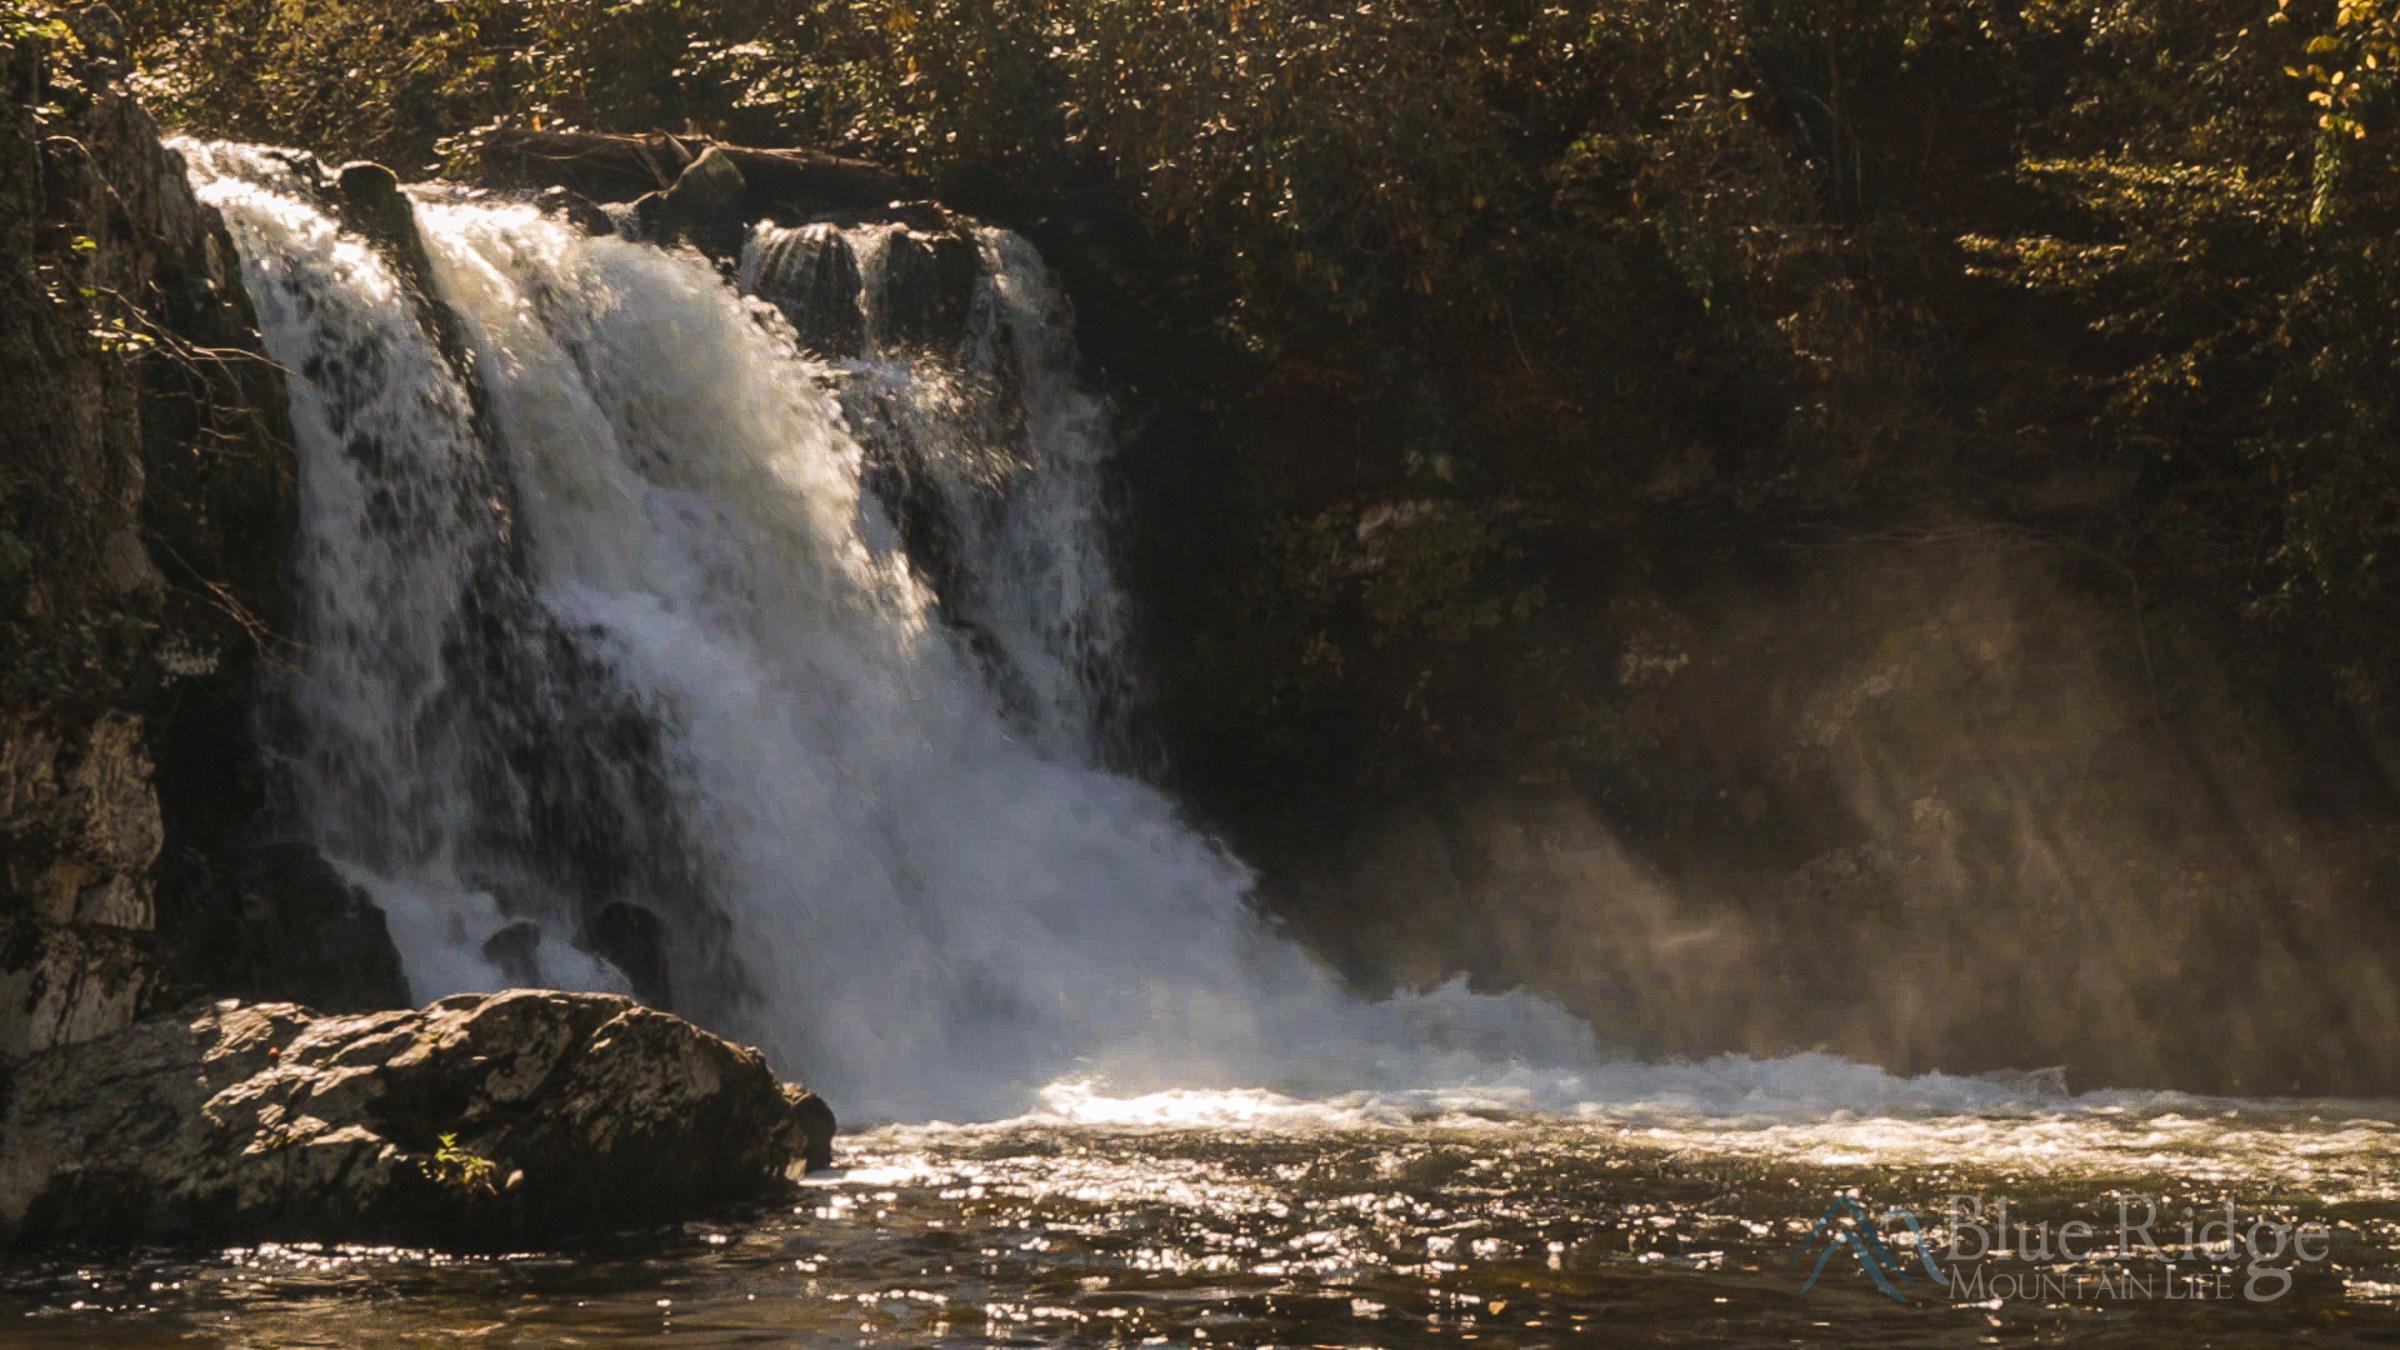 Abrams Falls Trail, Cades Cove